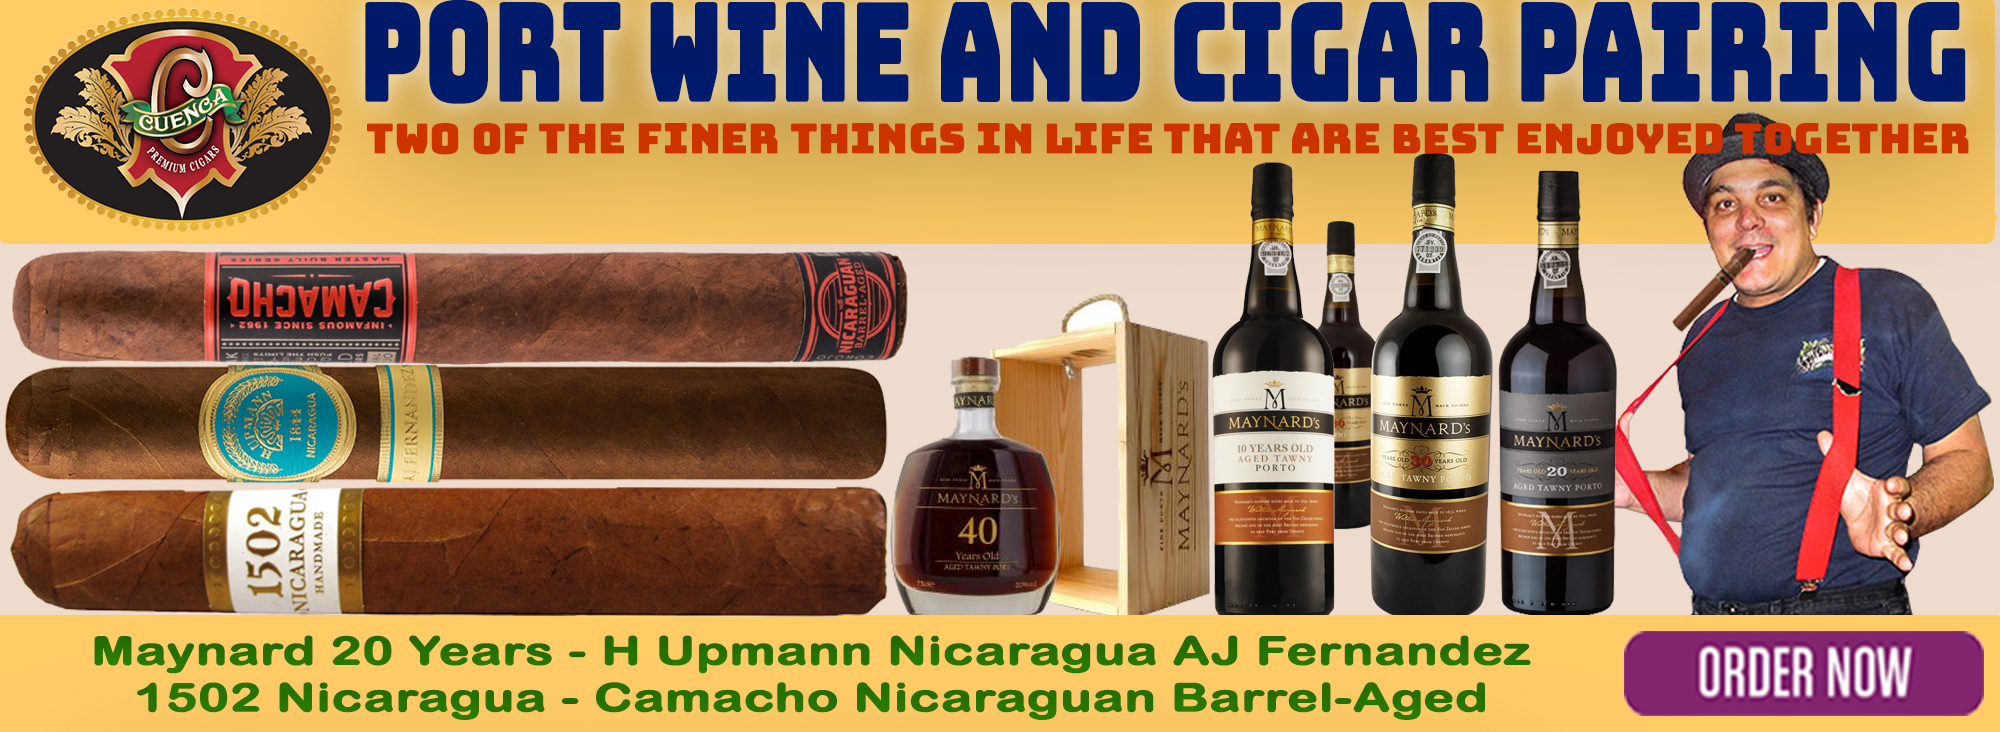 Port Wine and Cigar Pairing: Maynard 20 Years